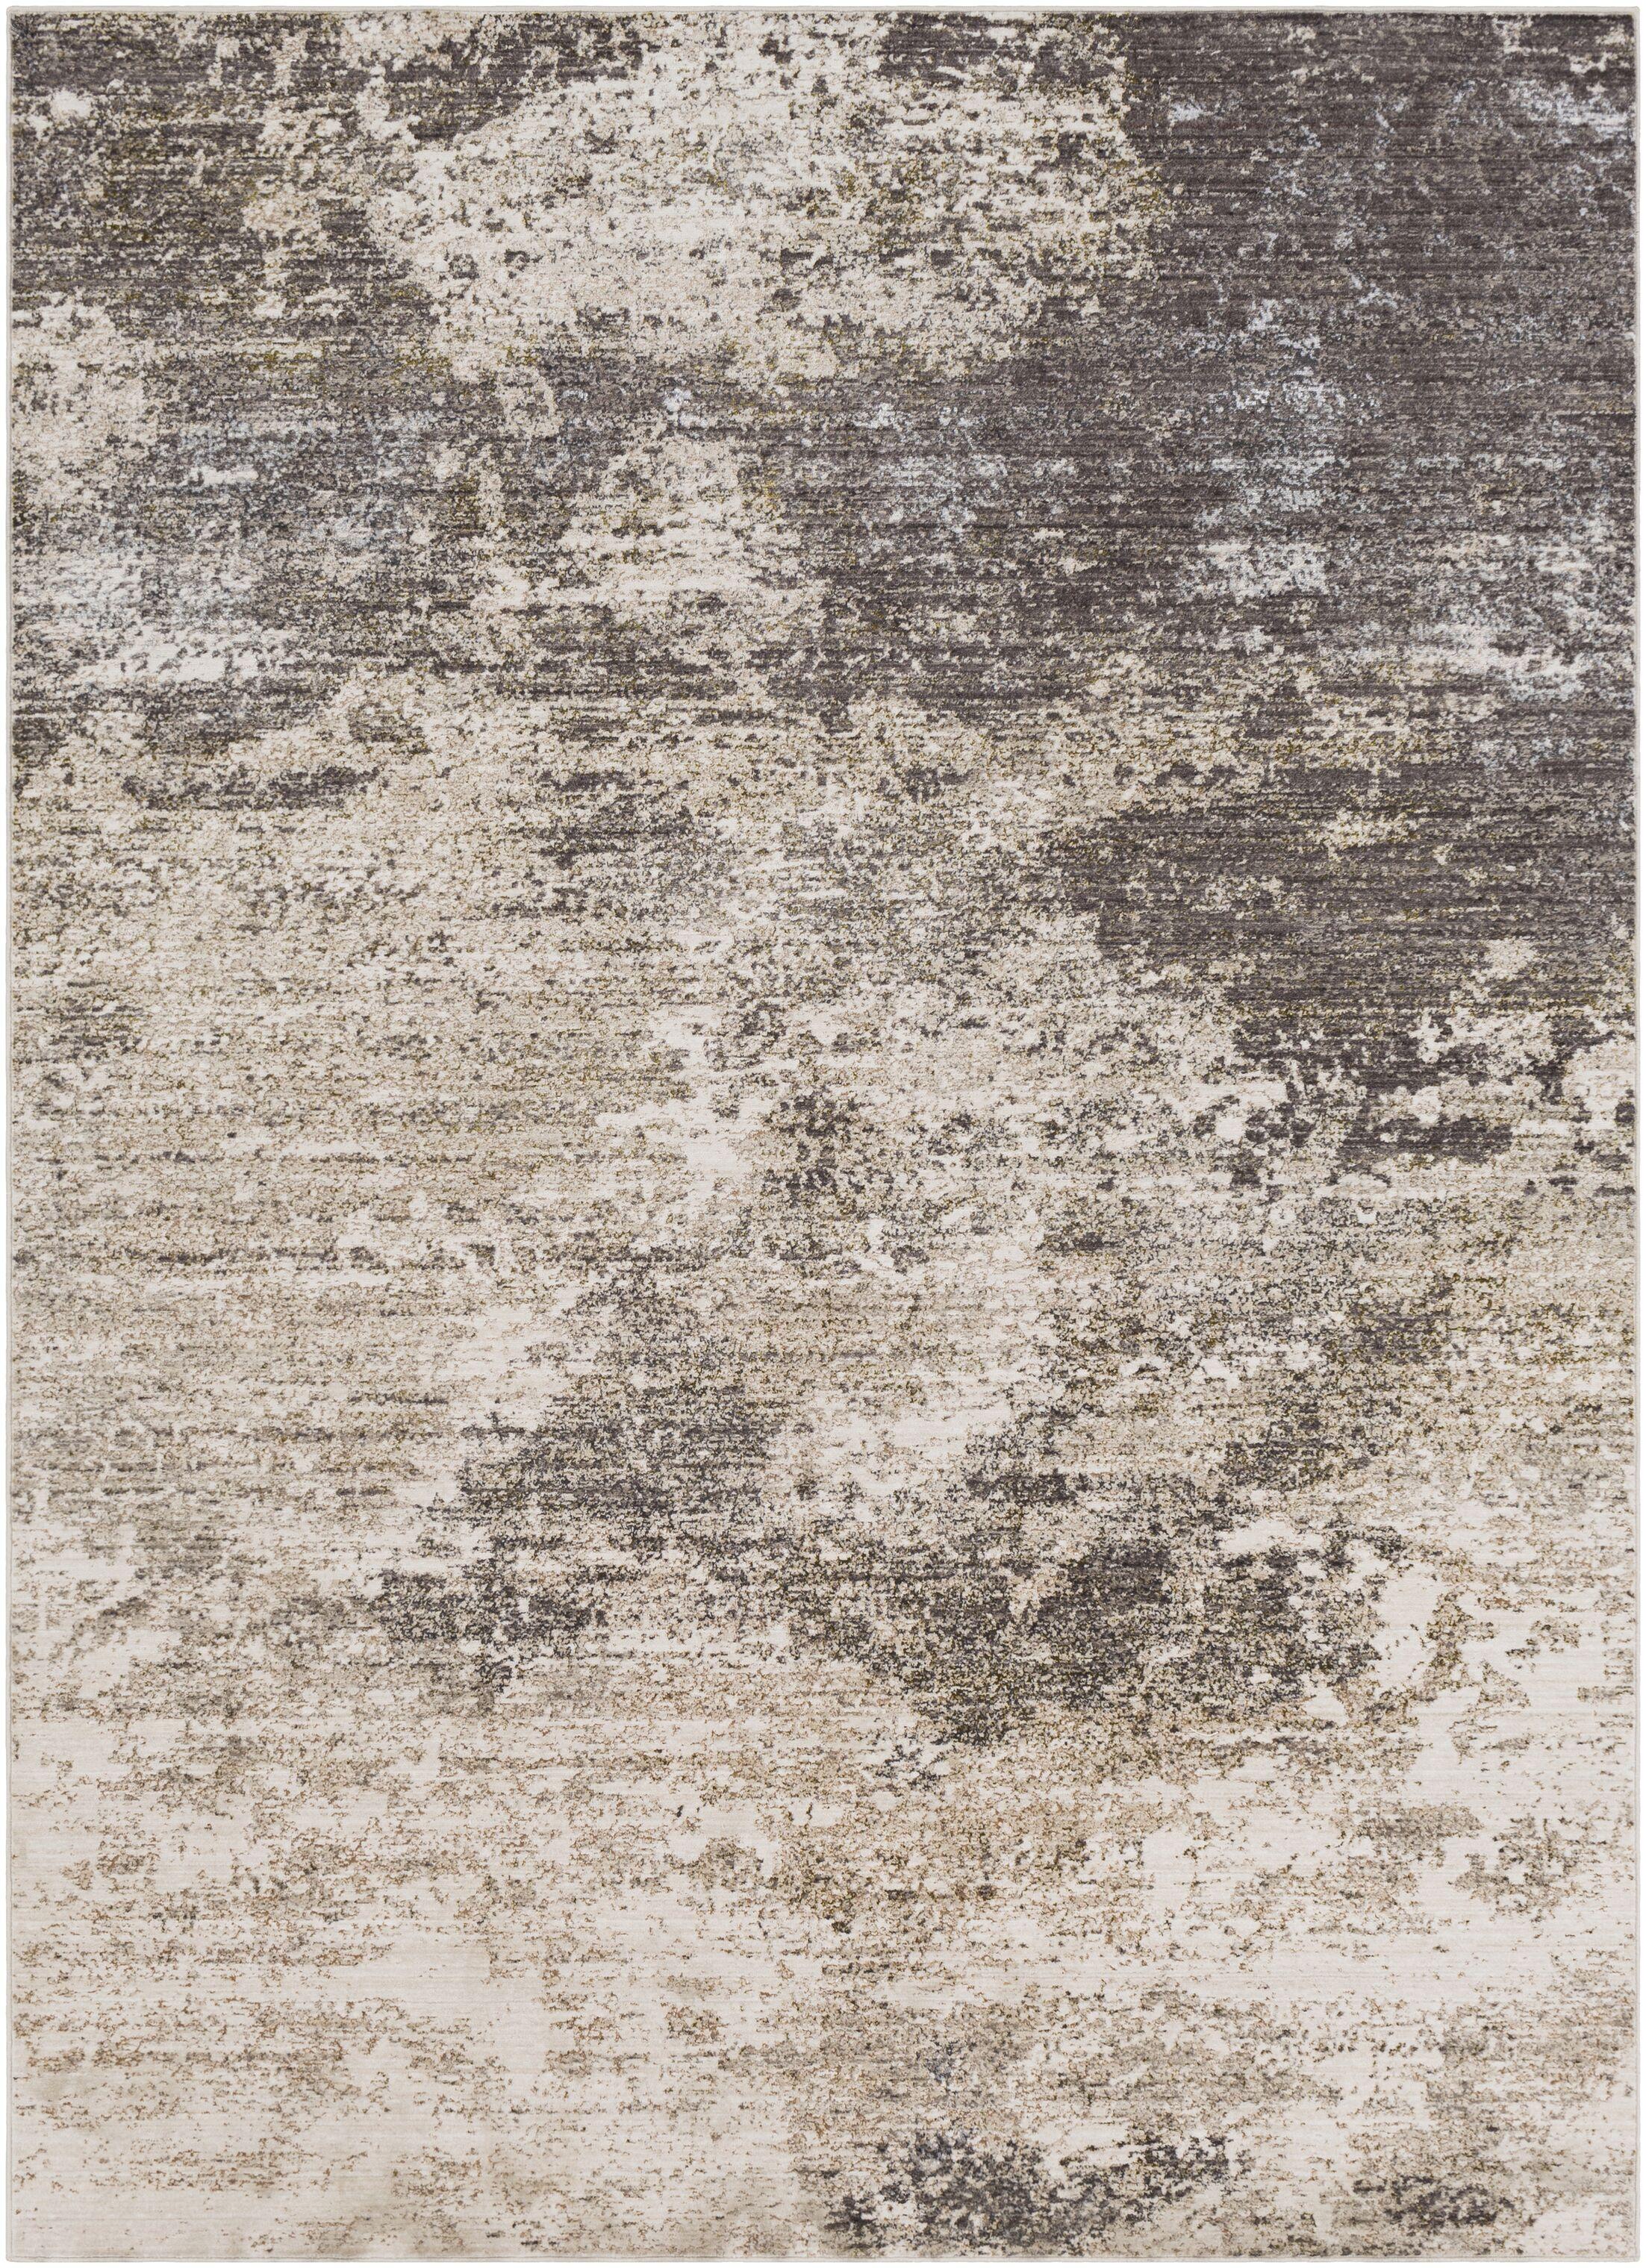 Granger Beige/Medium Gray Area Rug Rug Size: Rectangle 7'10